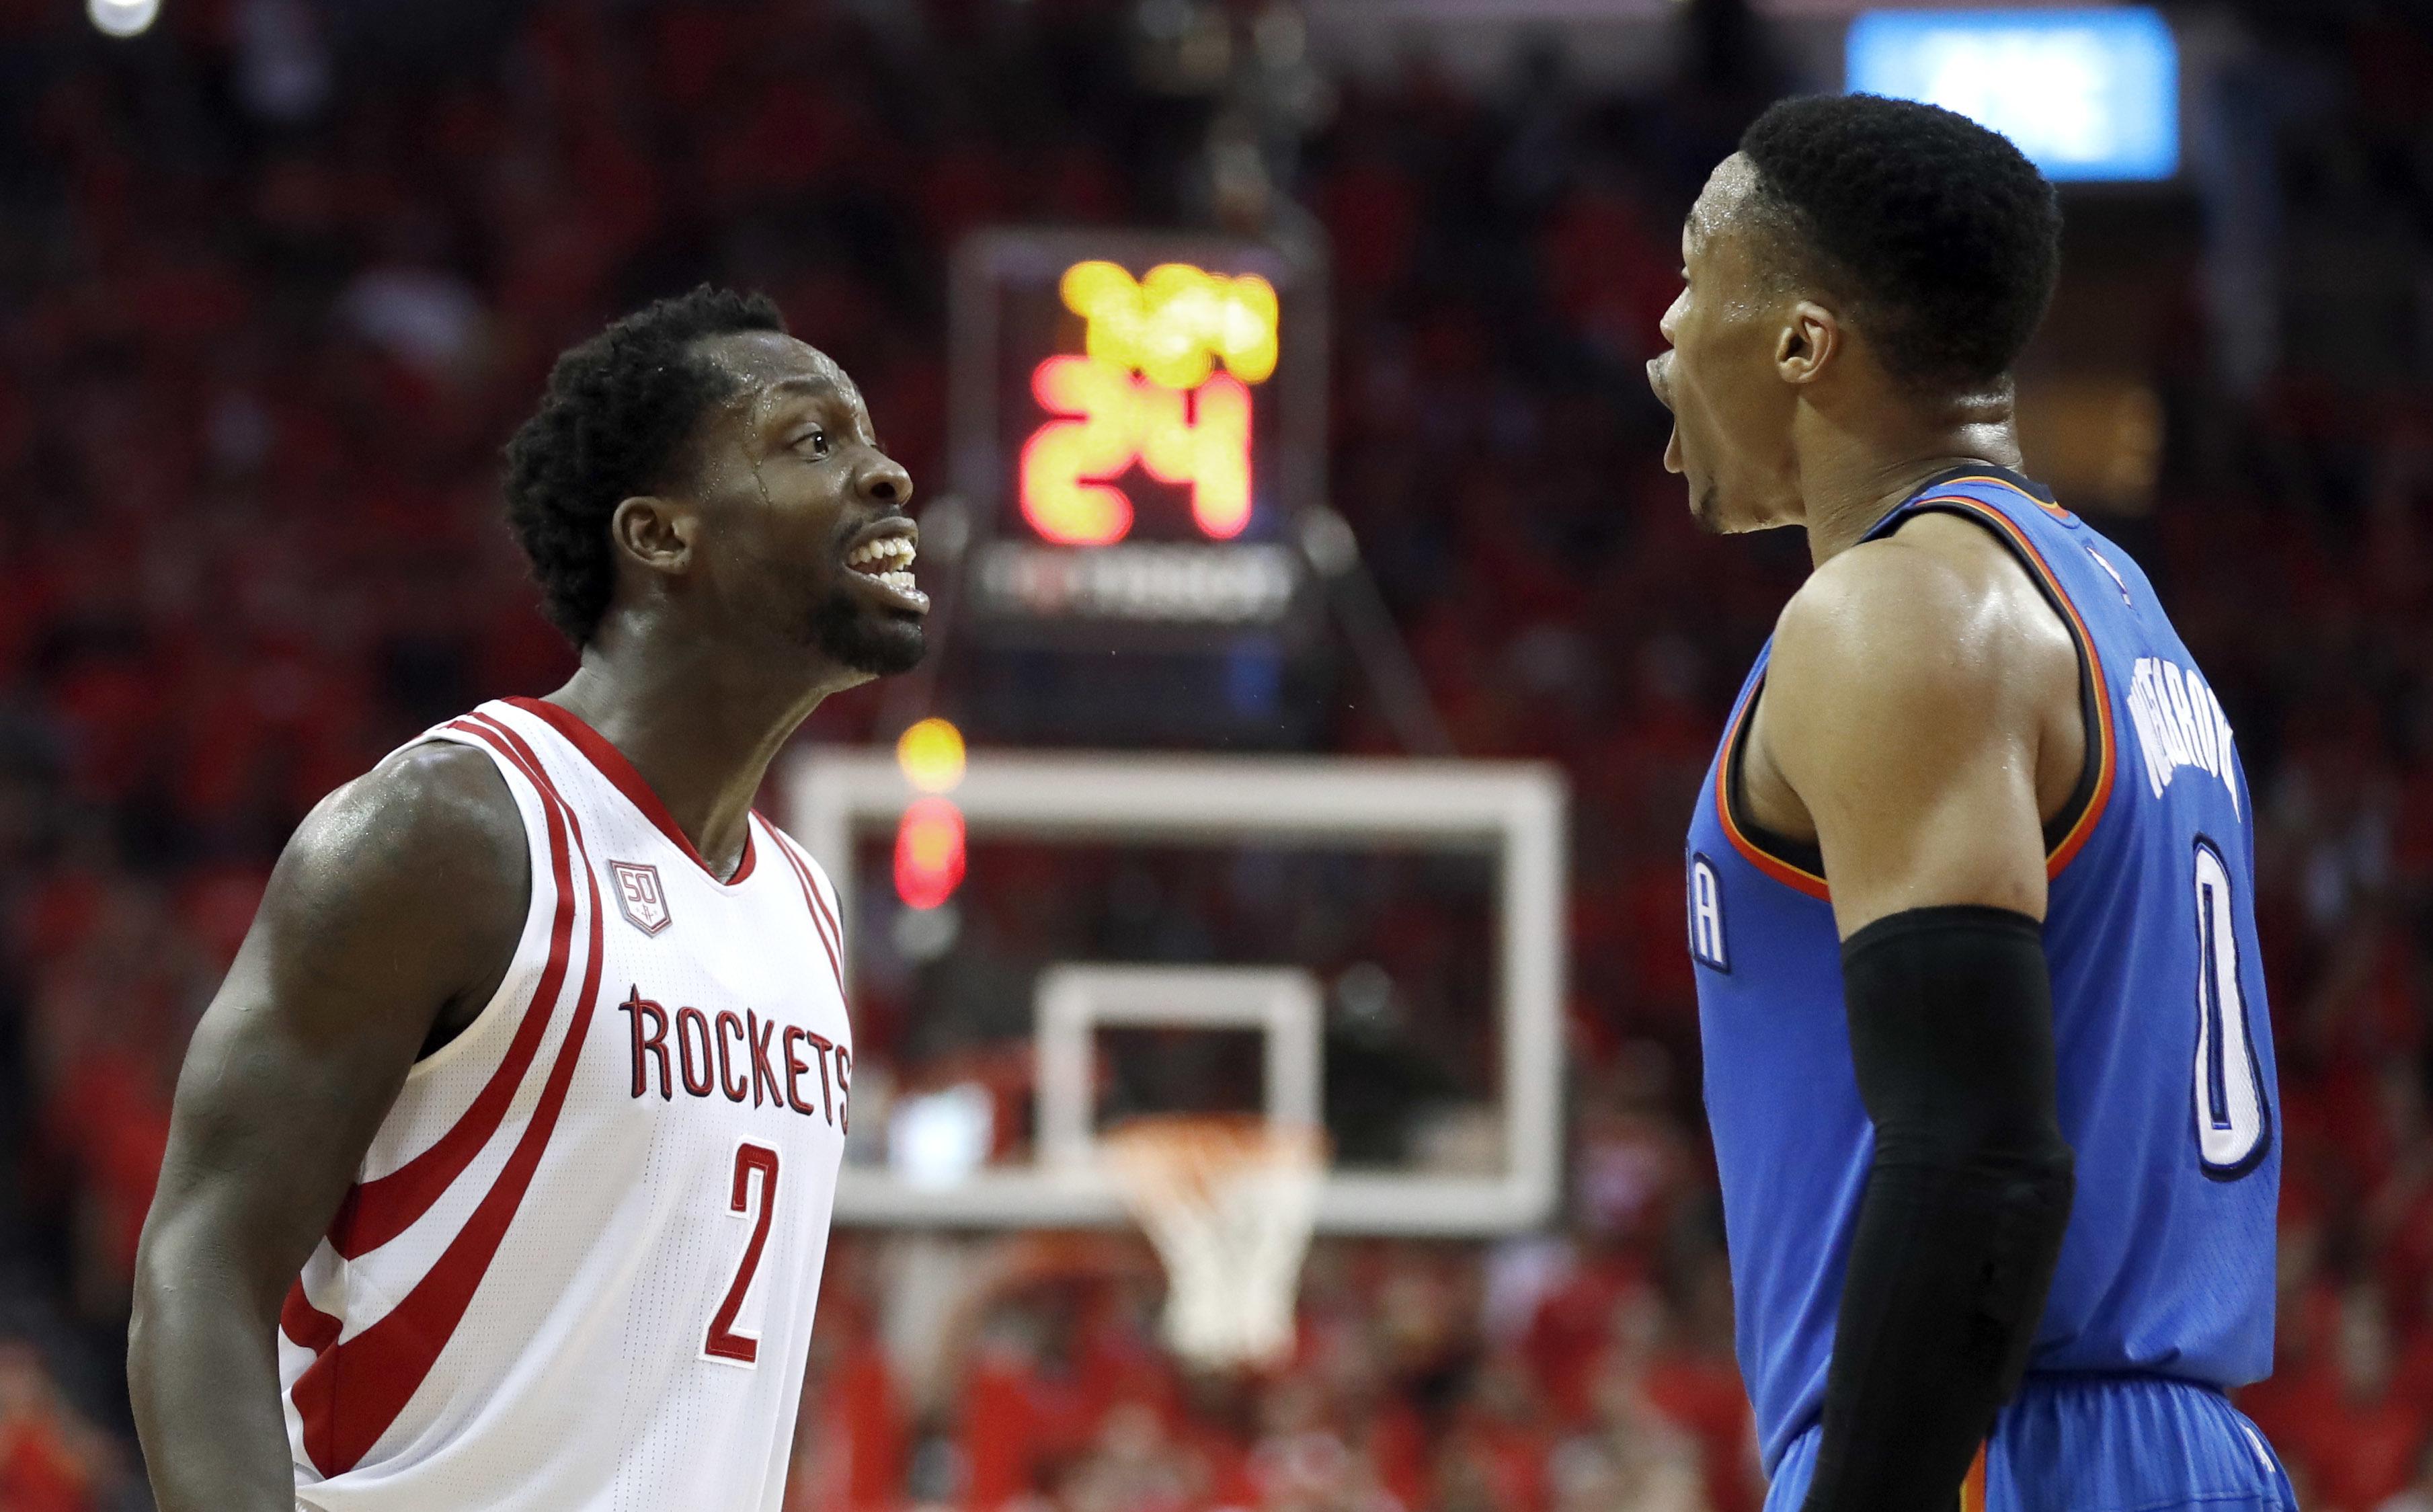 Basket - NBA - Westbrook et Oklahoma sortis par Houston, San Antonio l'emporte